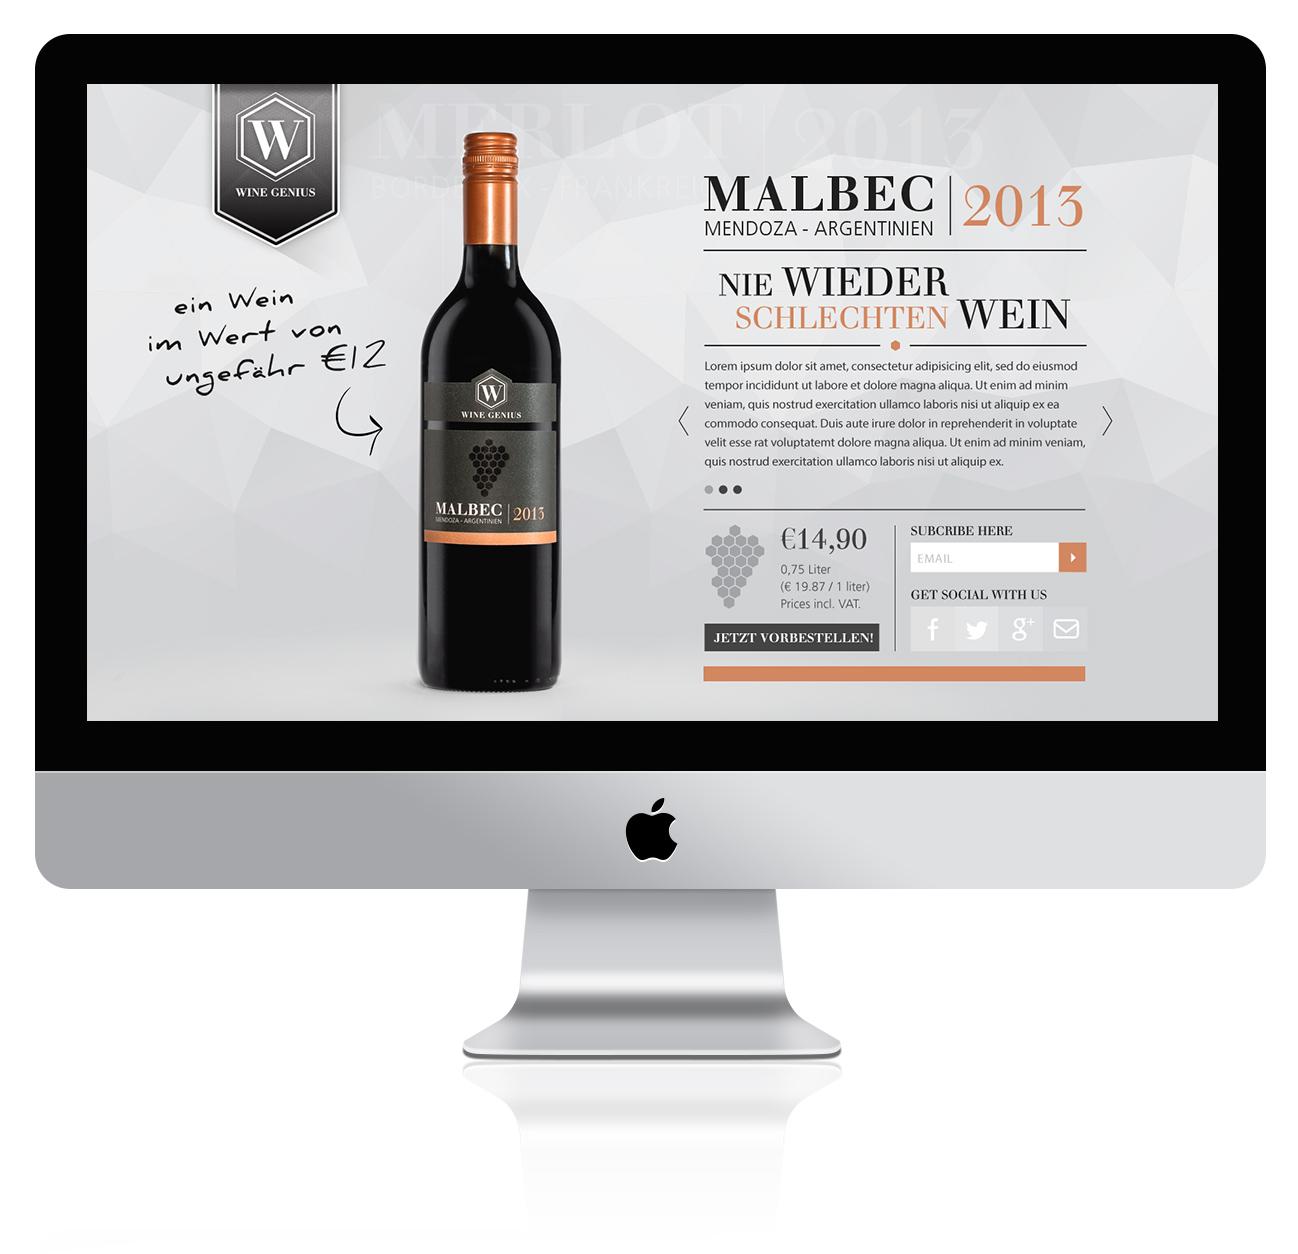 Malbec Wine Label Design & Web Branding - Landing page design